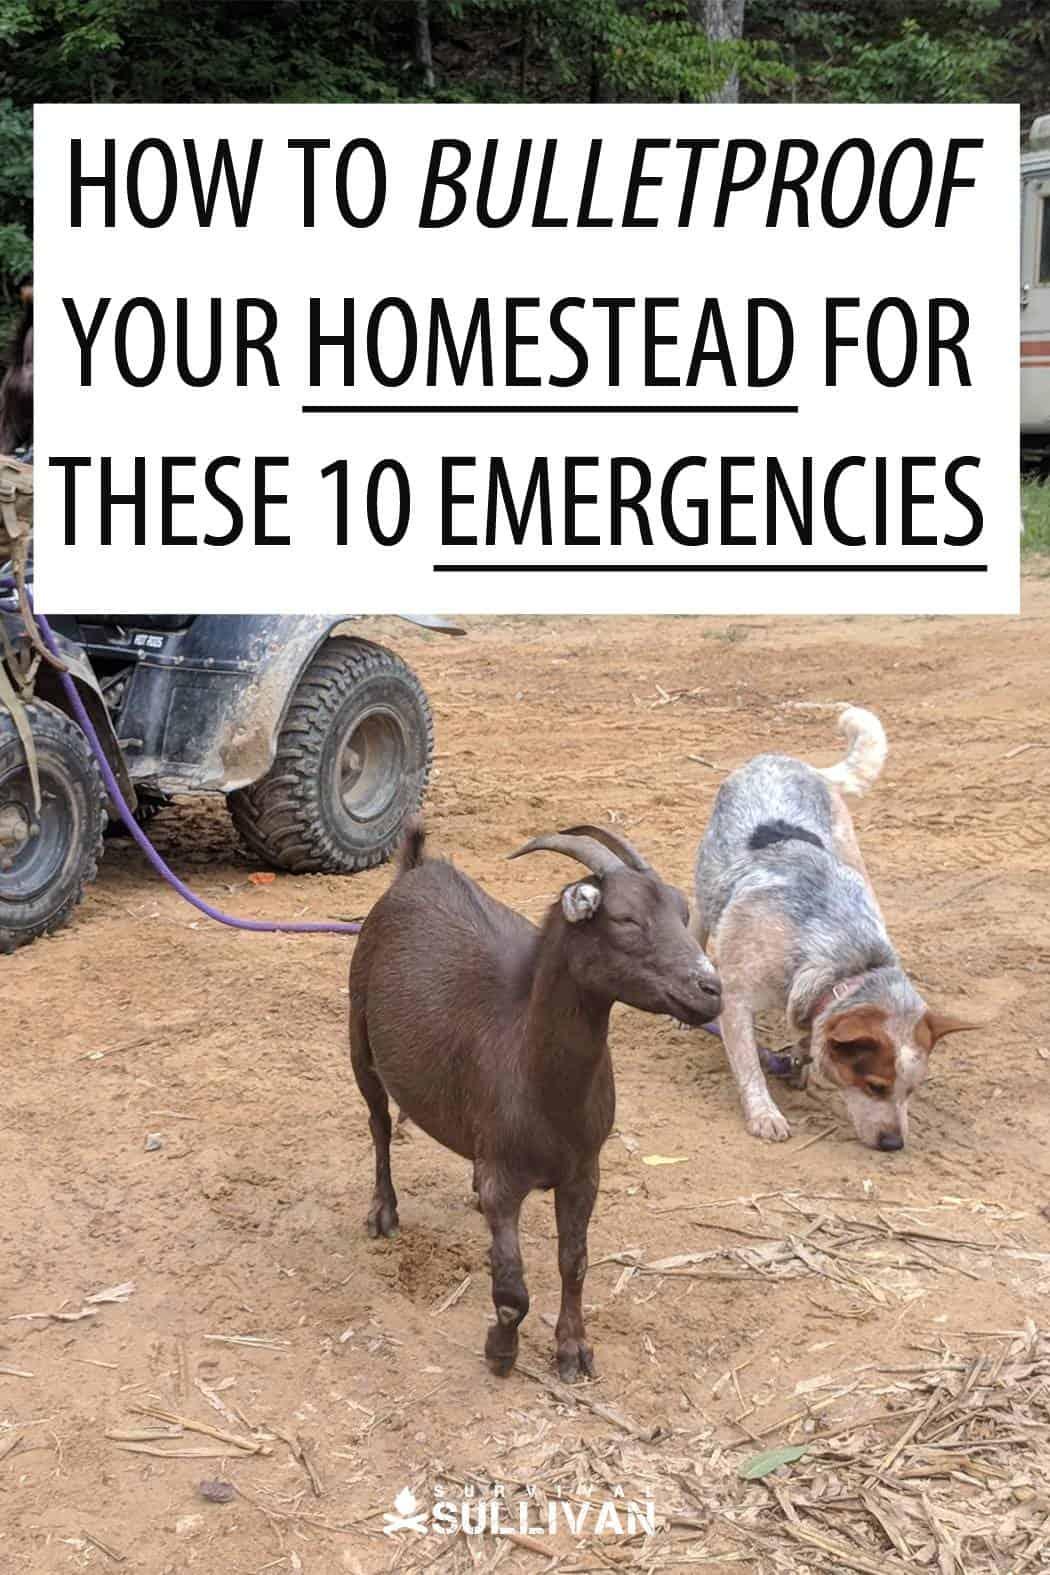 homestead emergencies Pinterest image